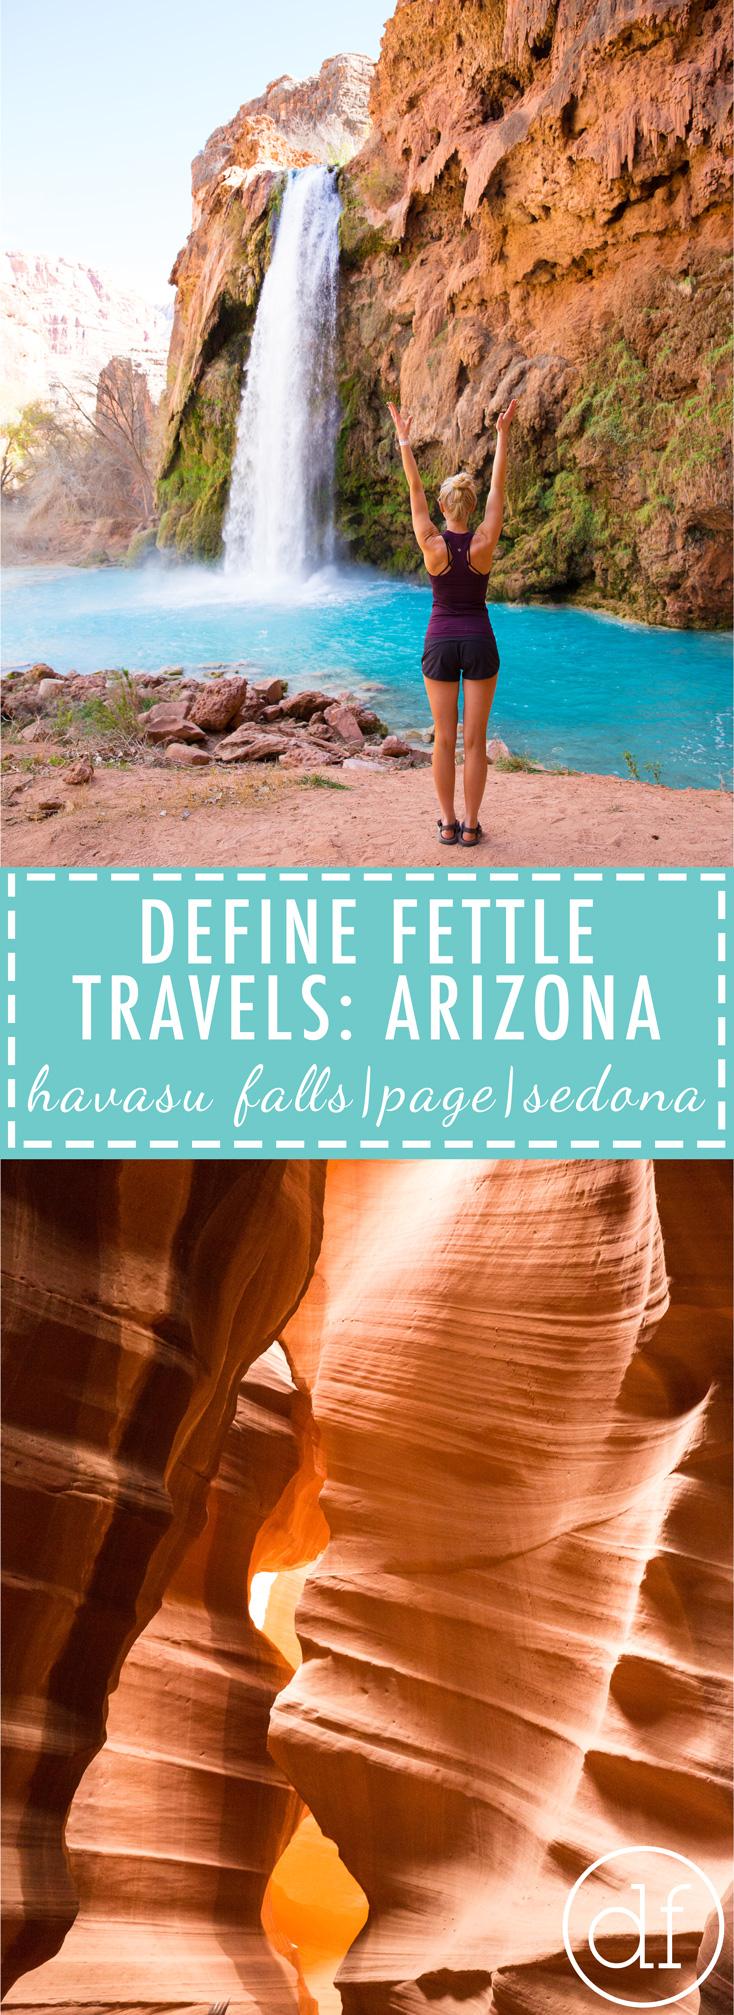 Travel Arizona, Explore Arizona, Havasu Falls, Antelope Canyon, Horseshoe Bend, Grand Canyon, Sedona, Sedona Proposal, Define Fettle, Define Fettle Travels